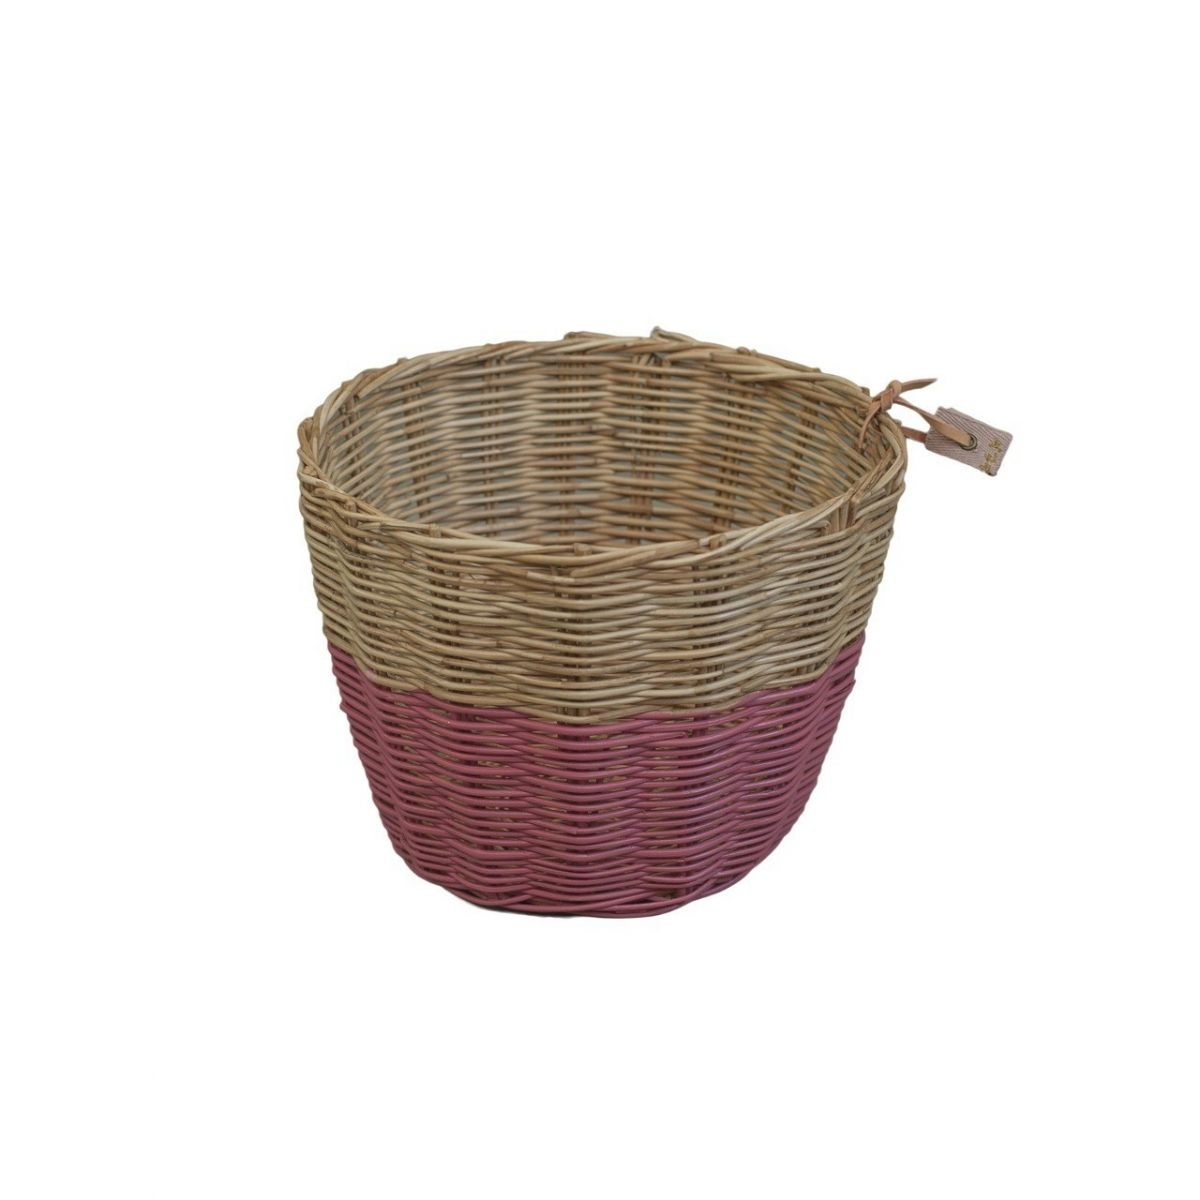 Numero 74 Basket rattan rose